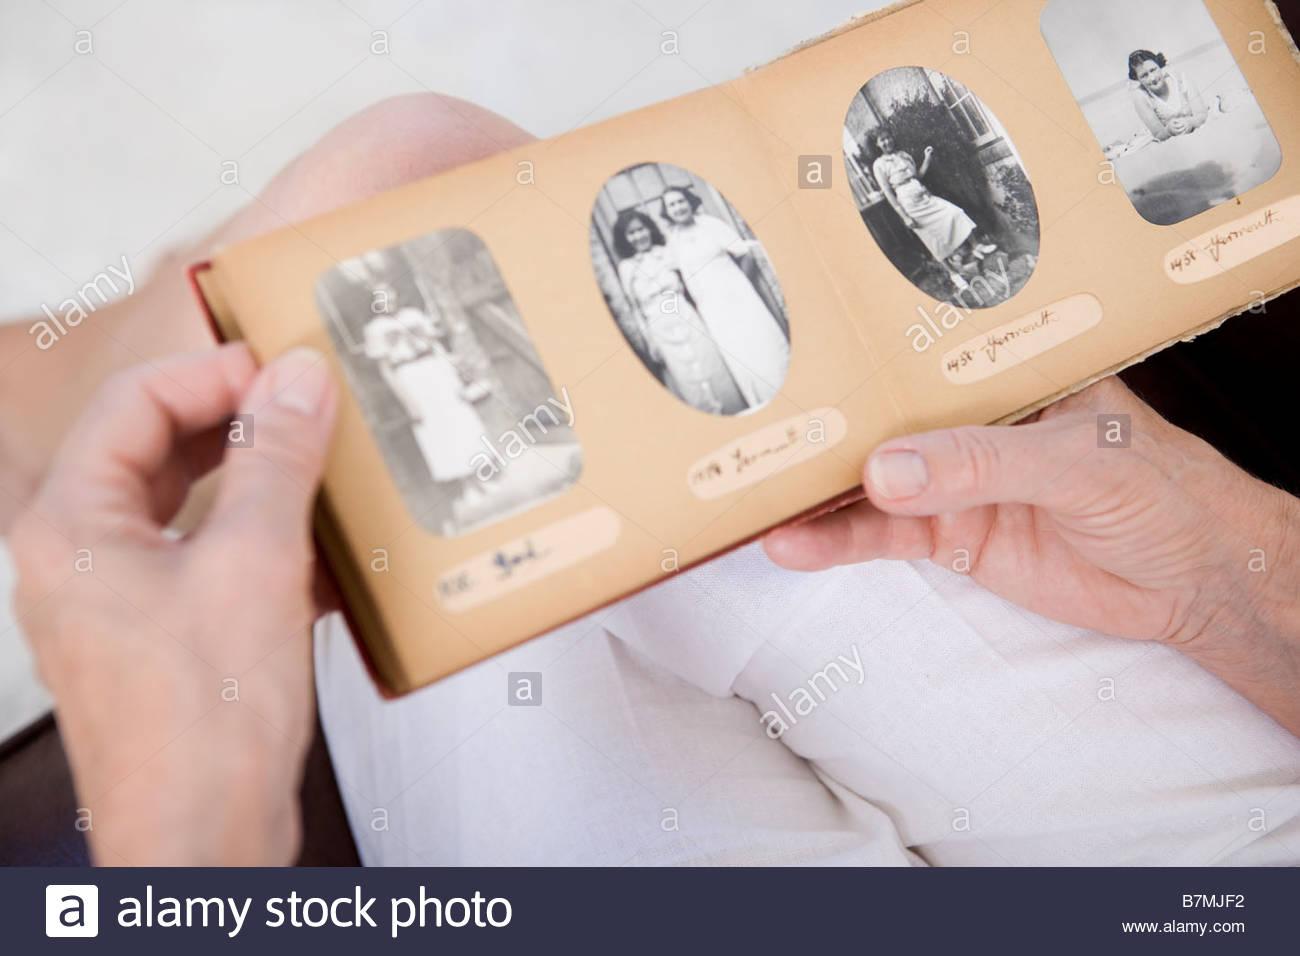 A senior woman looking at old photos de famille Photo Stock